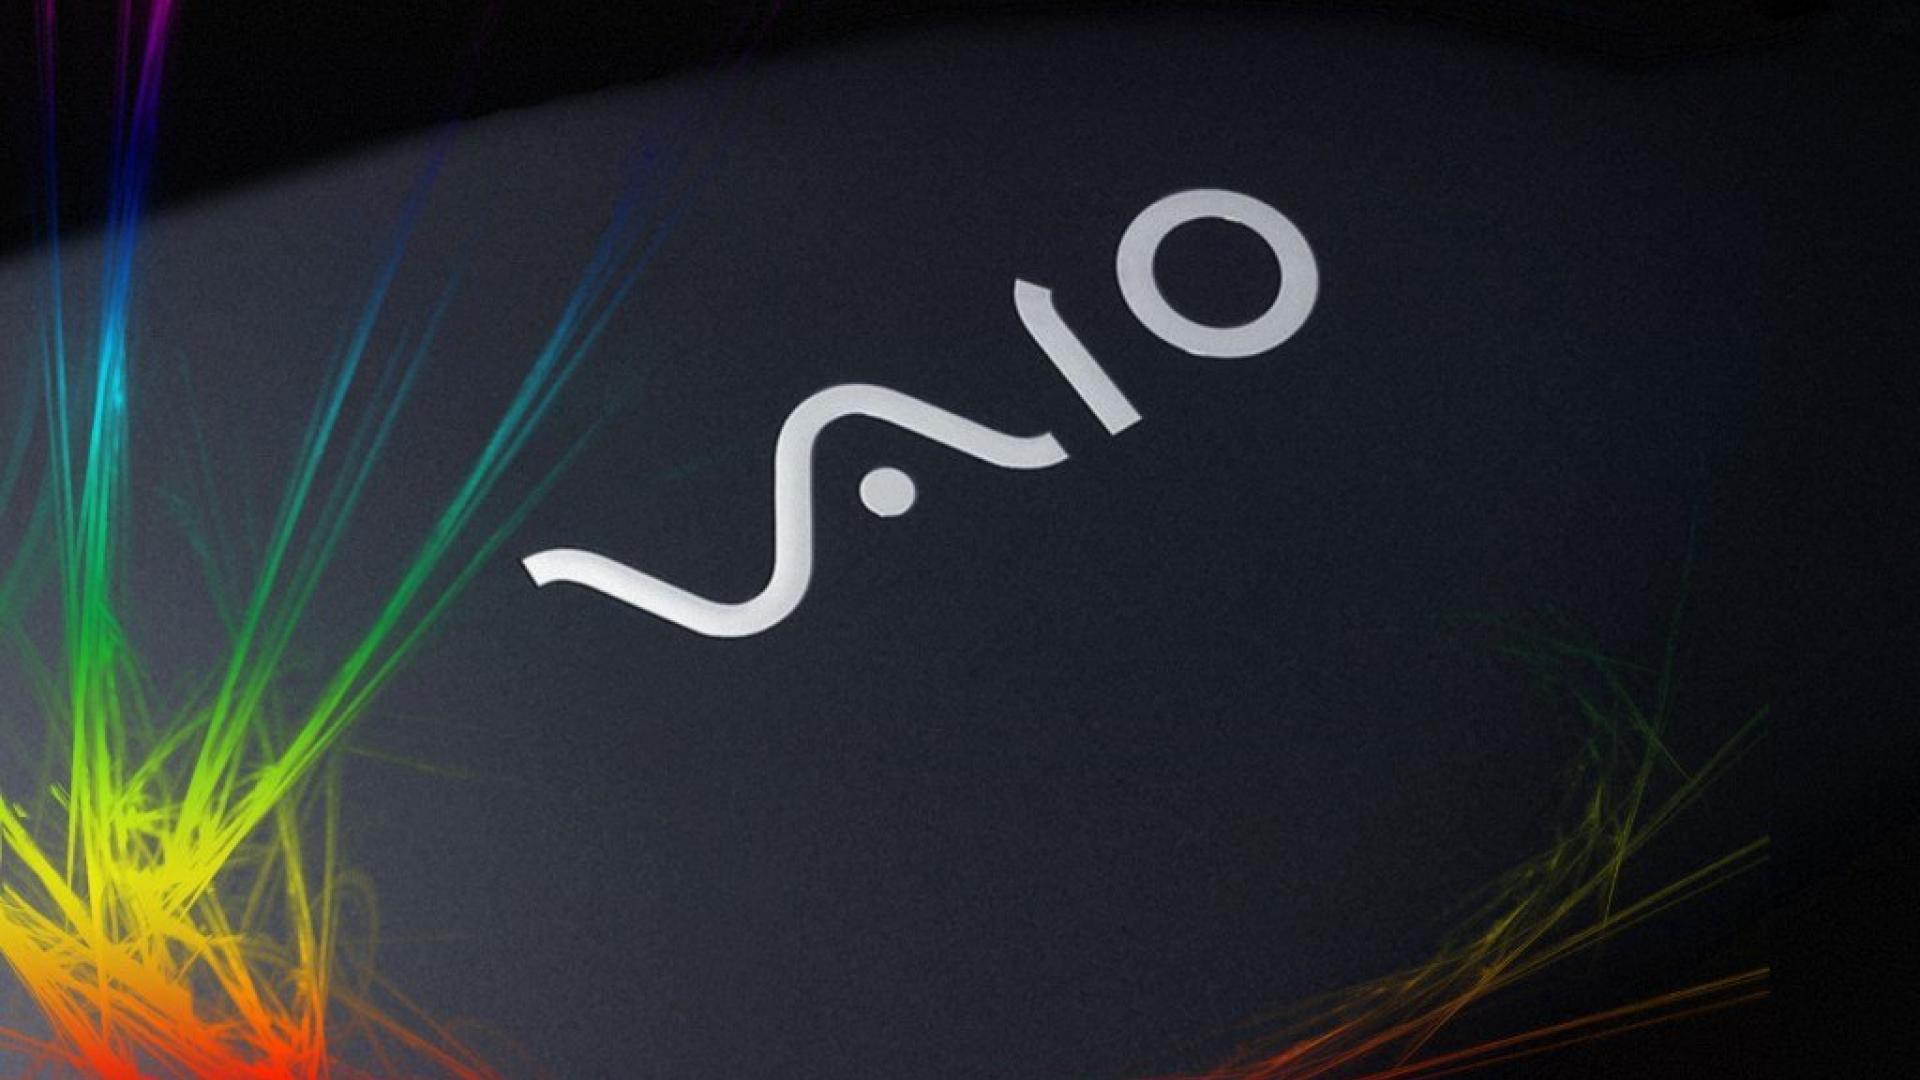 Sony vaio wallpaper 1920x1080 wallpapersafari - Sony vaio wallpaper 1280x800 ...